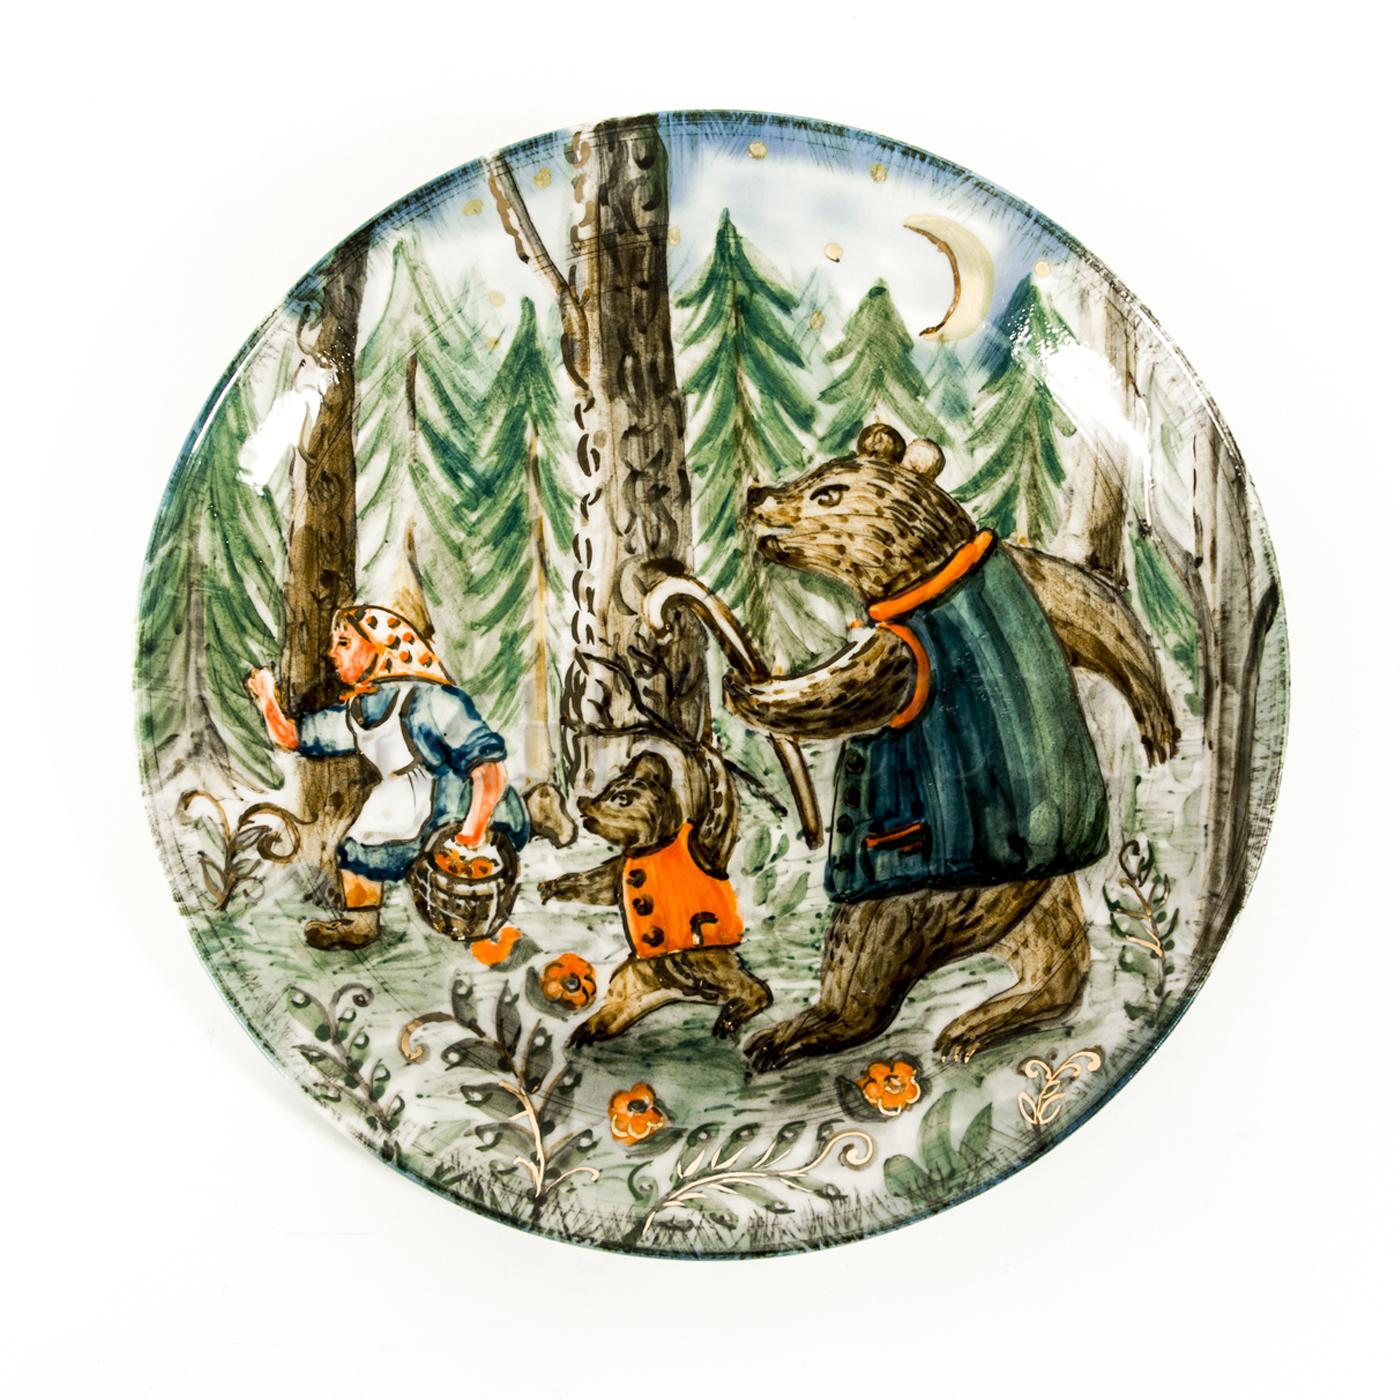 Тарелка декоративная «Маша и Медведи» в красках